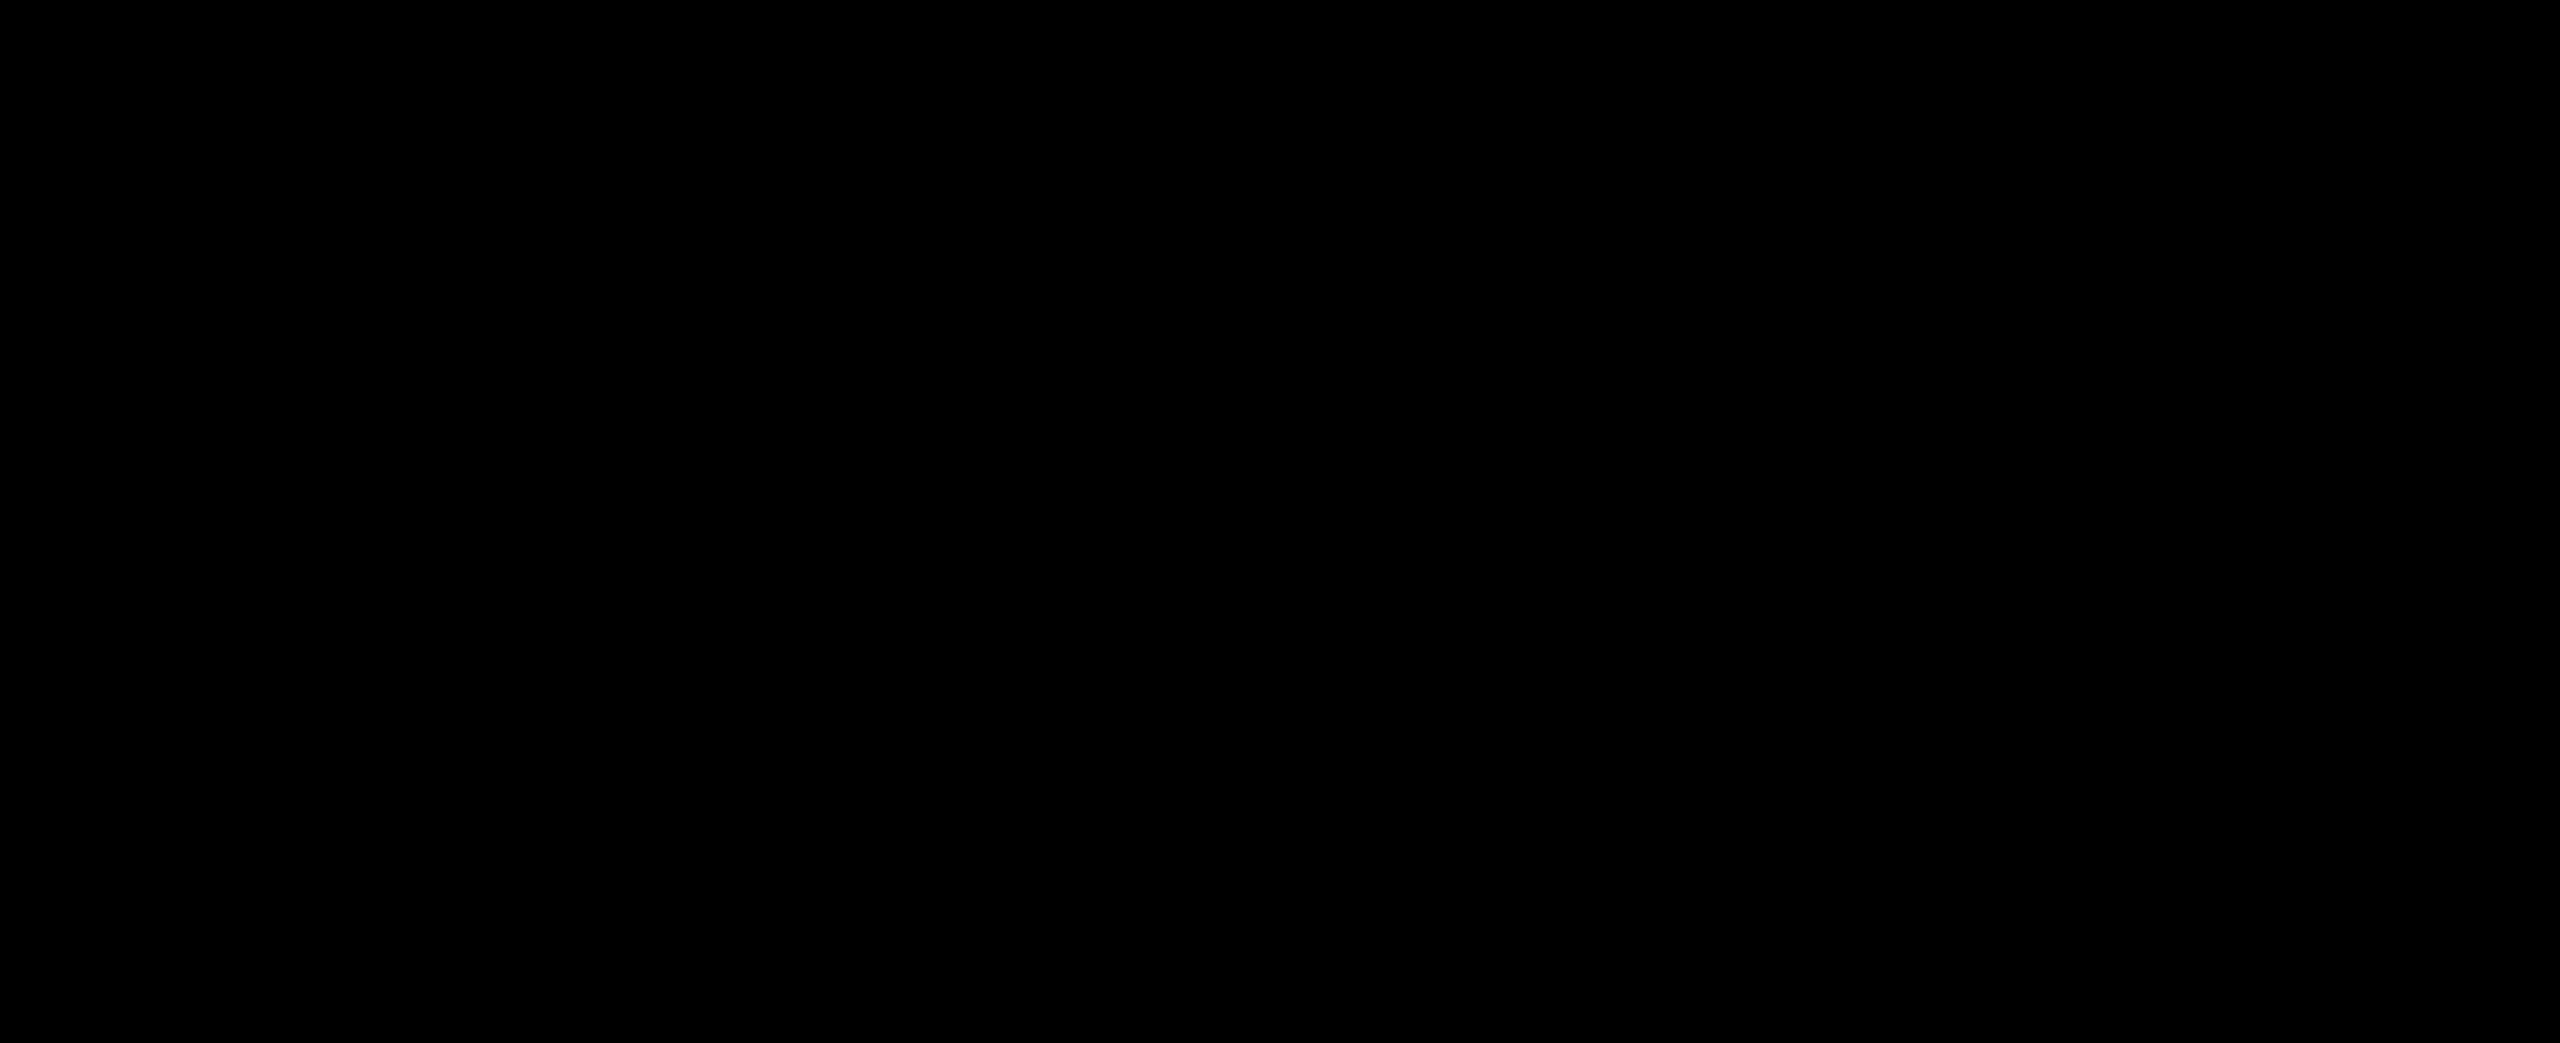 katrinvogel-alphorn